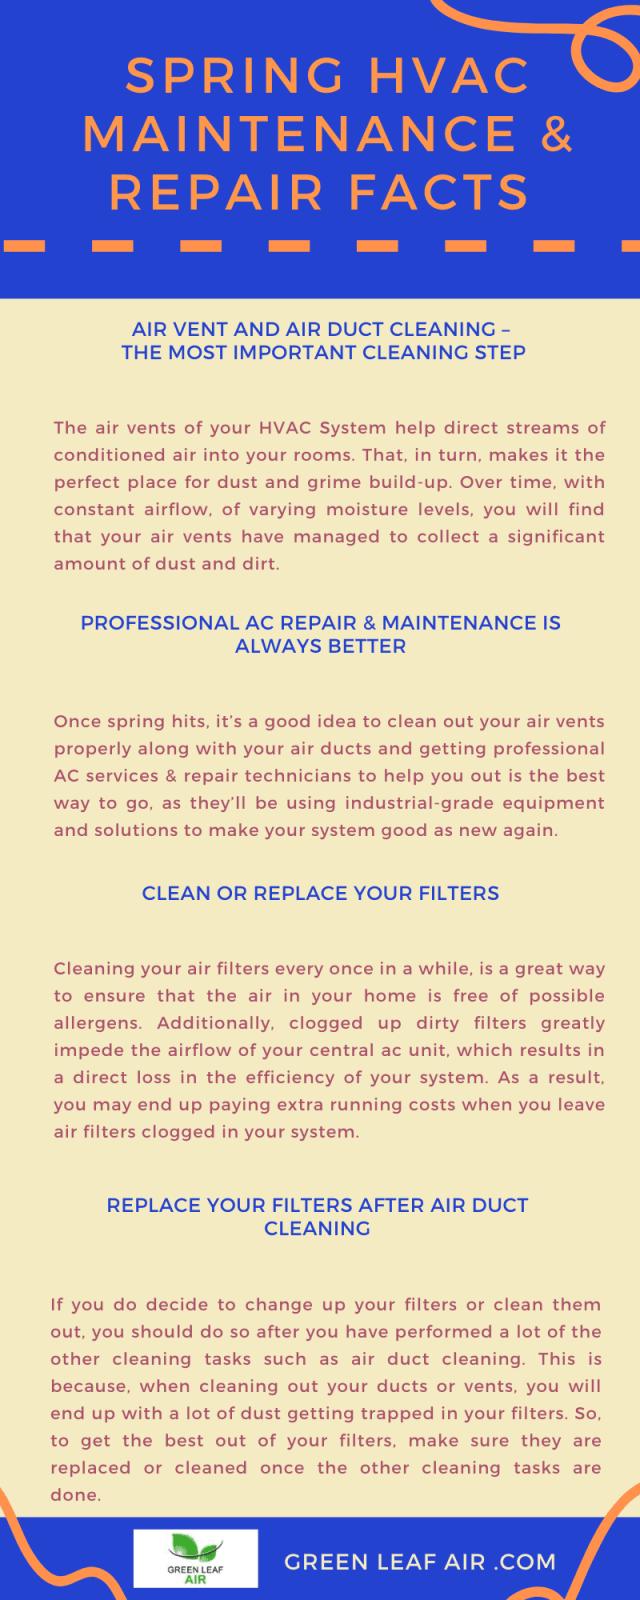 Spring HVAC Maintenance & Repair Facts